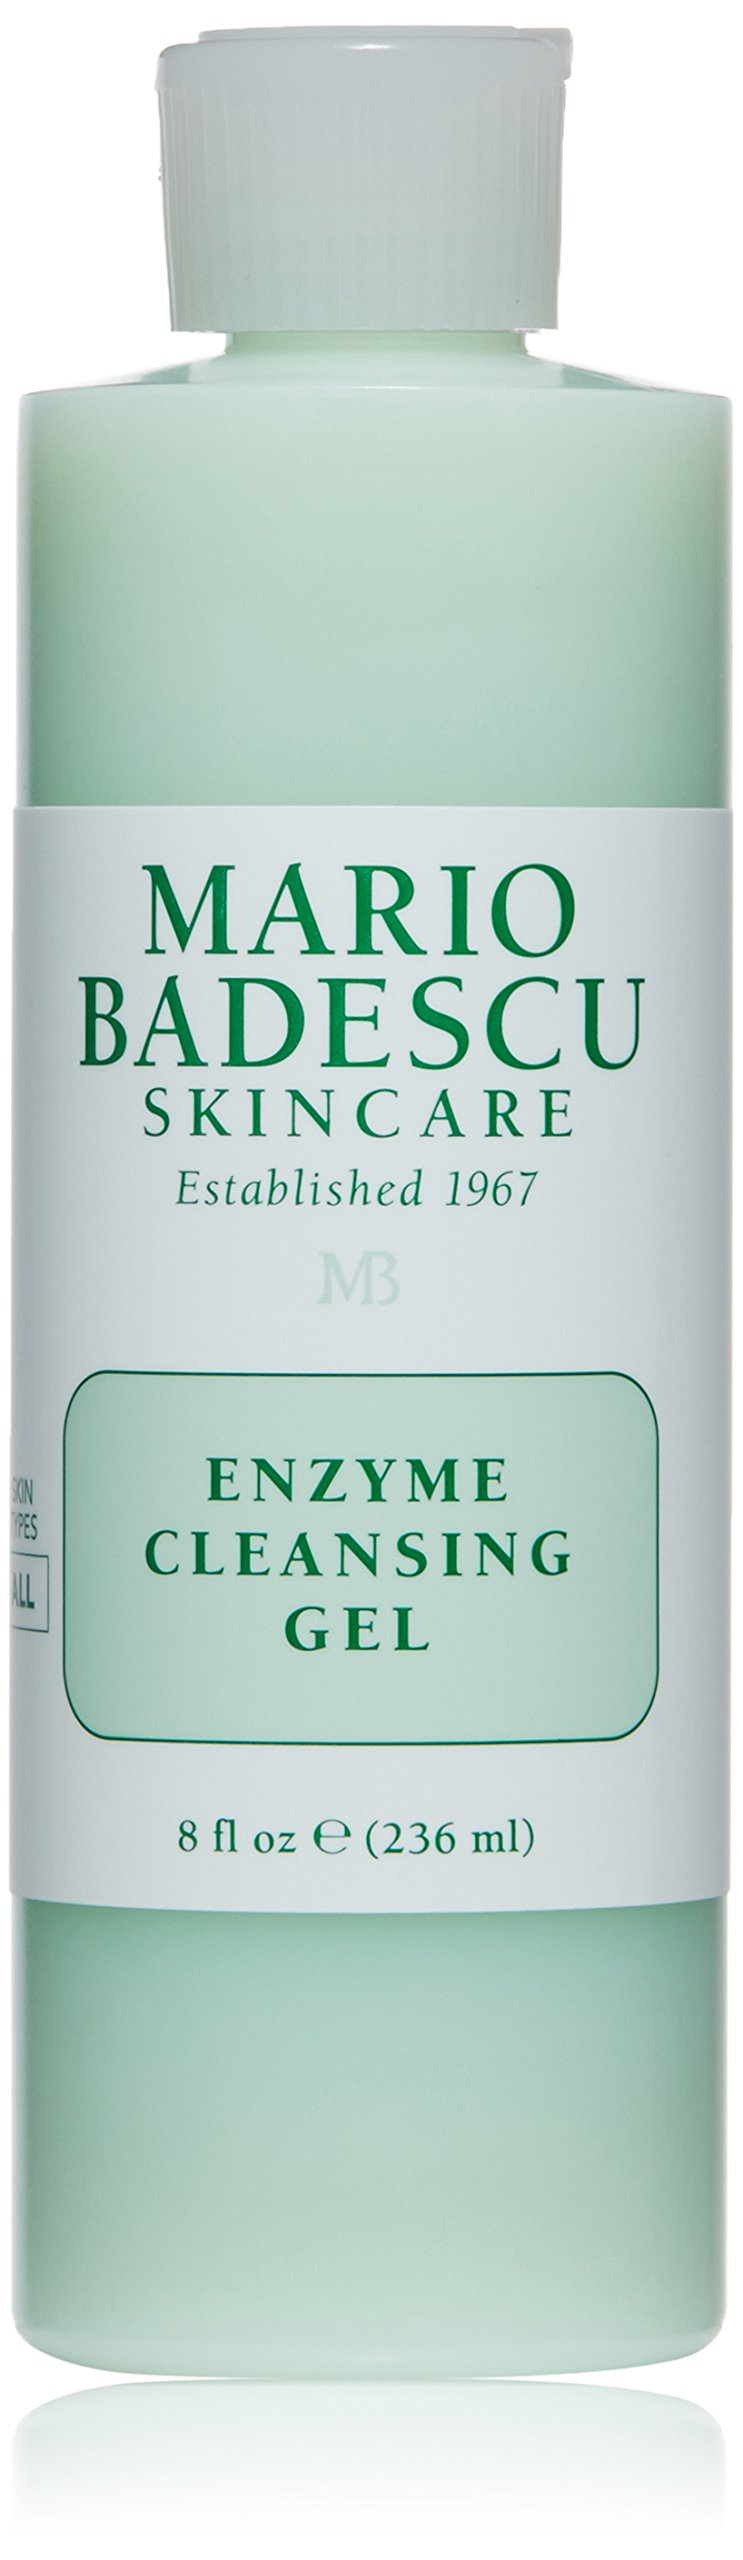 Mario Badescu Enzyme Cleansing Gel, 8 oz. by Mario Badescu